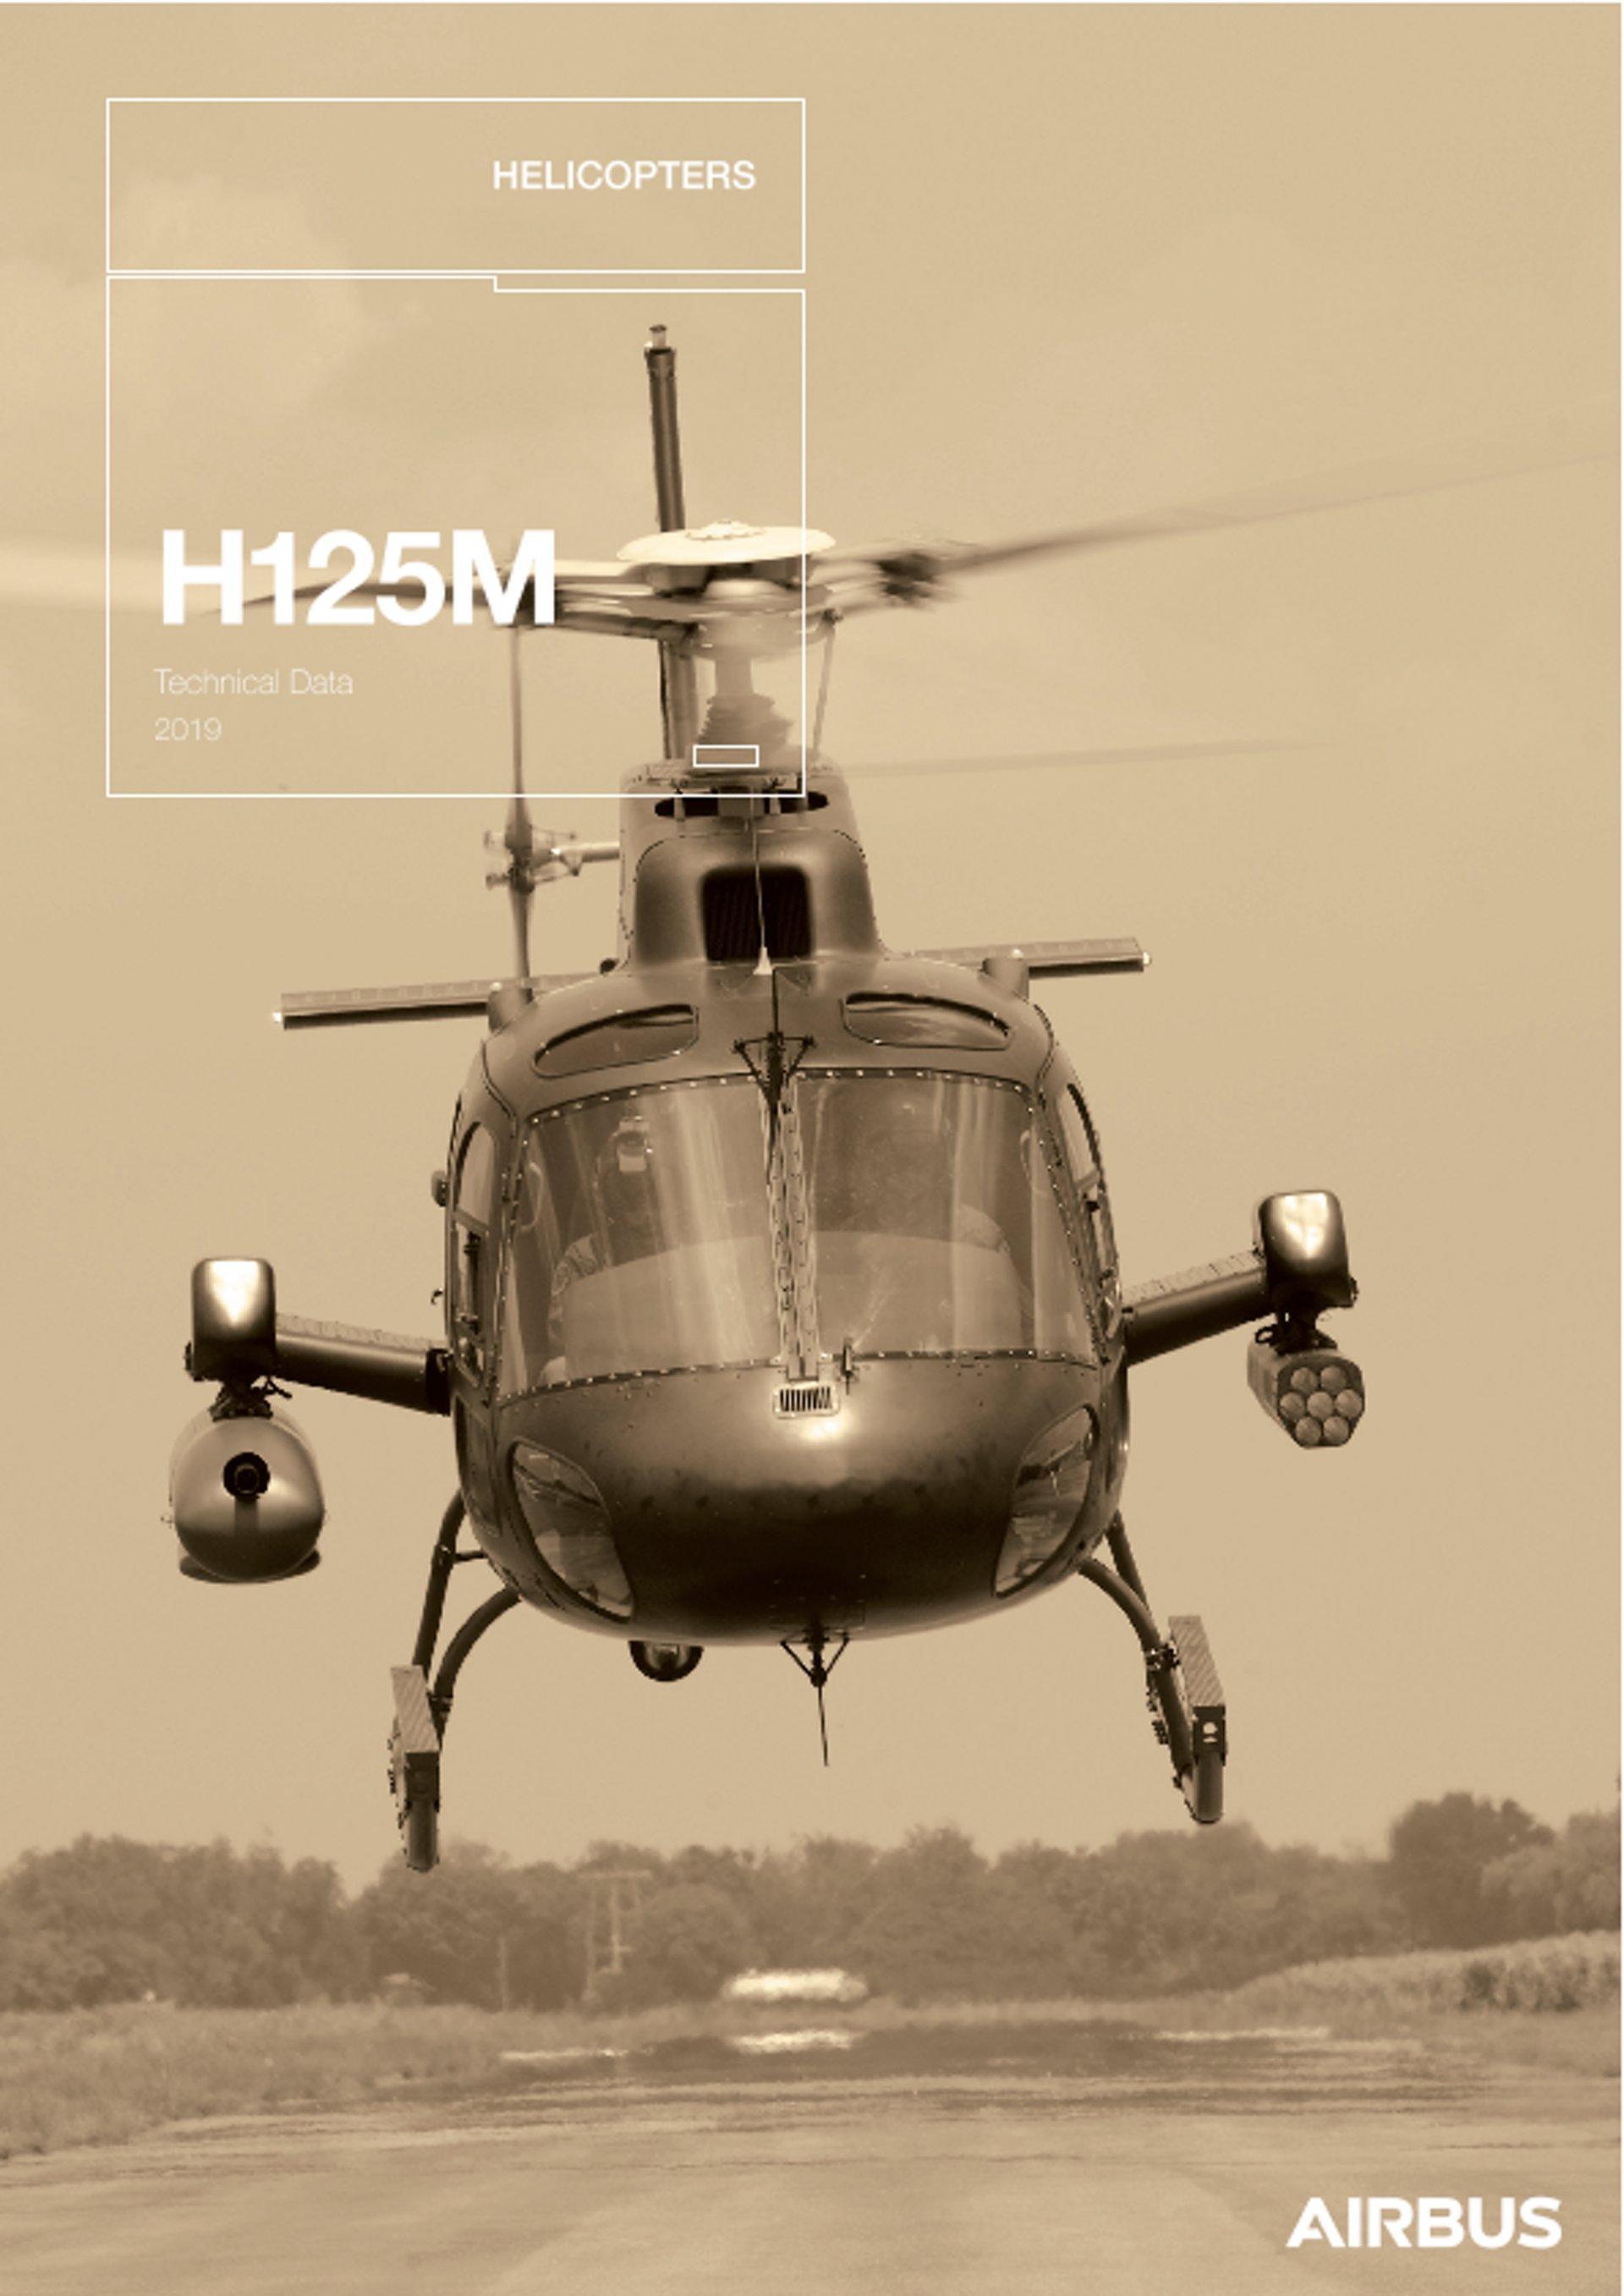 H125M-Technical Data